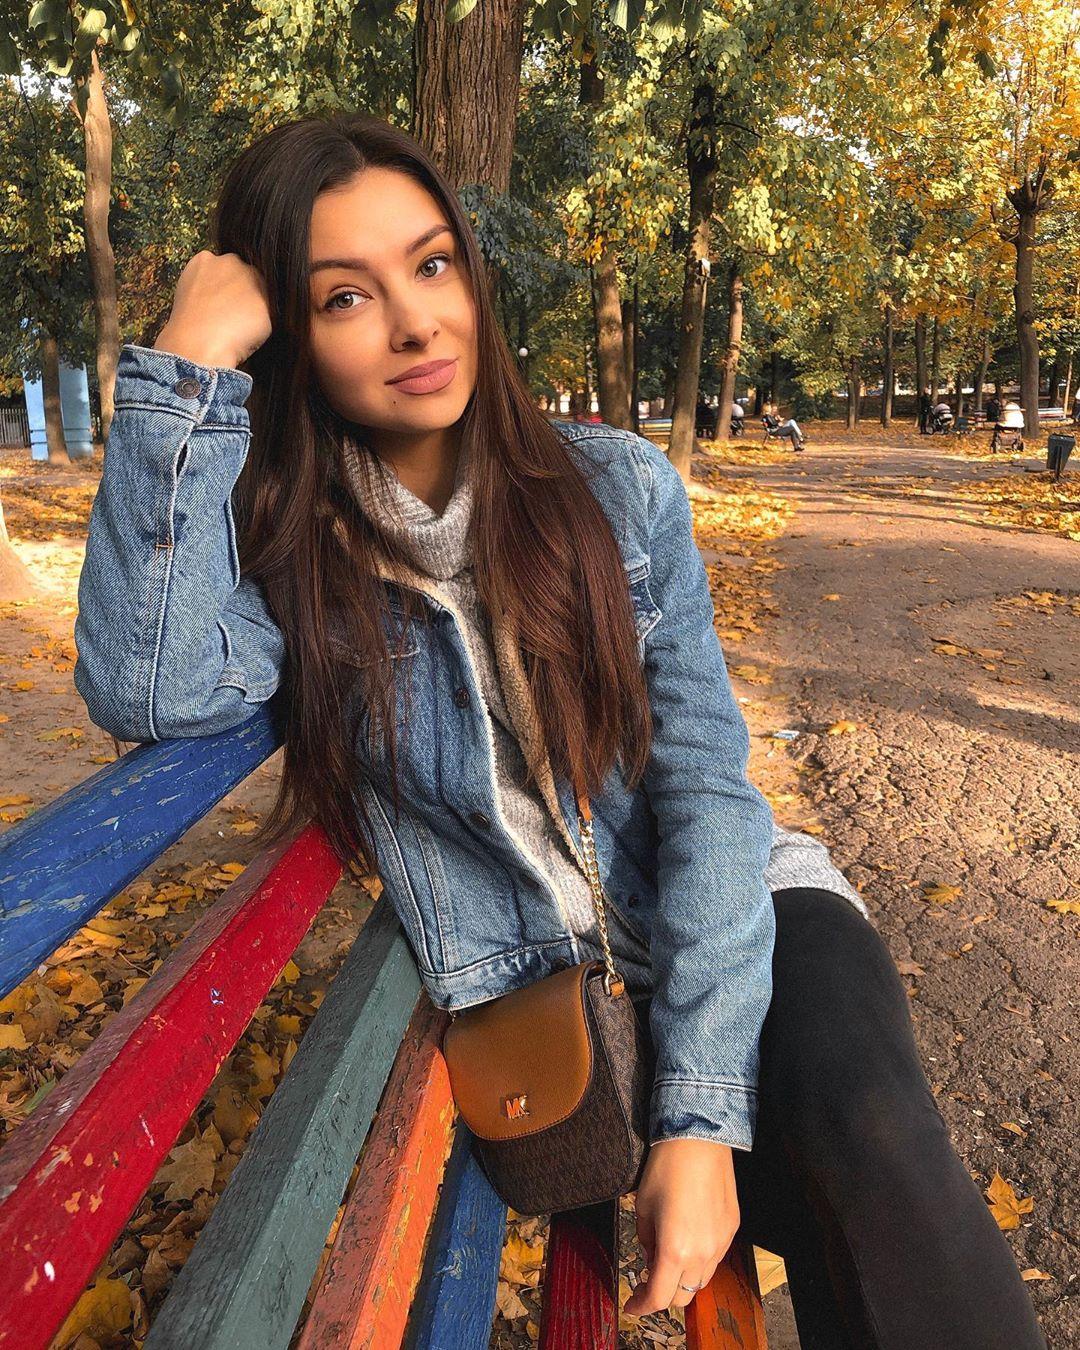 Alina-Brady-Wallpapers-Insta-Biography-3